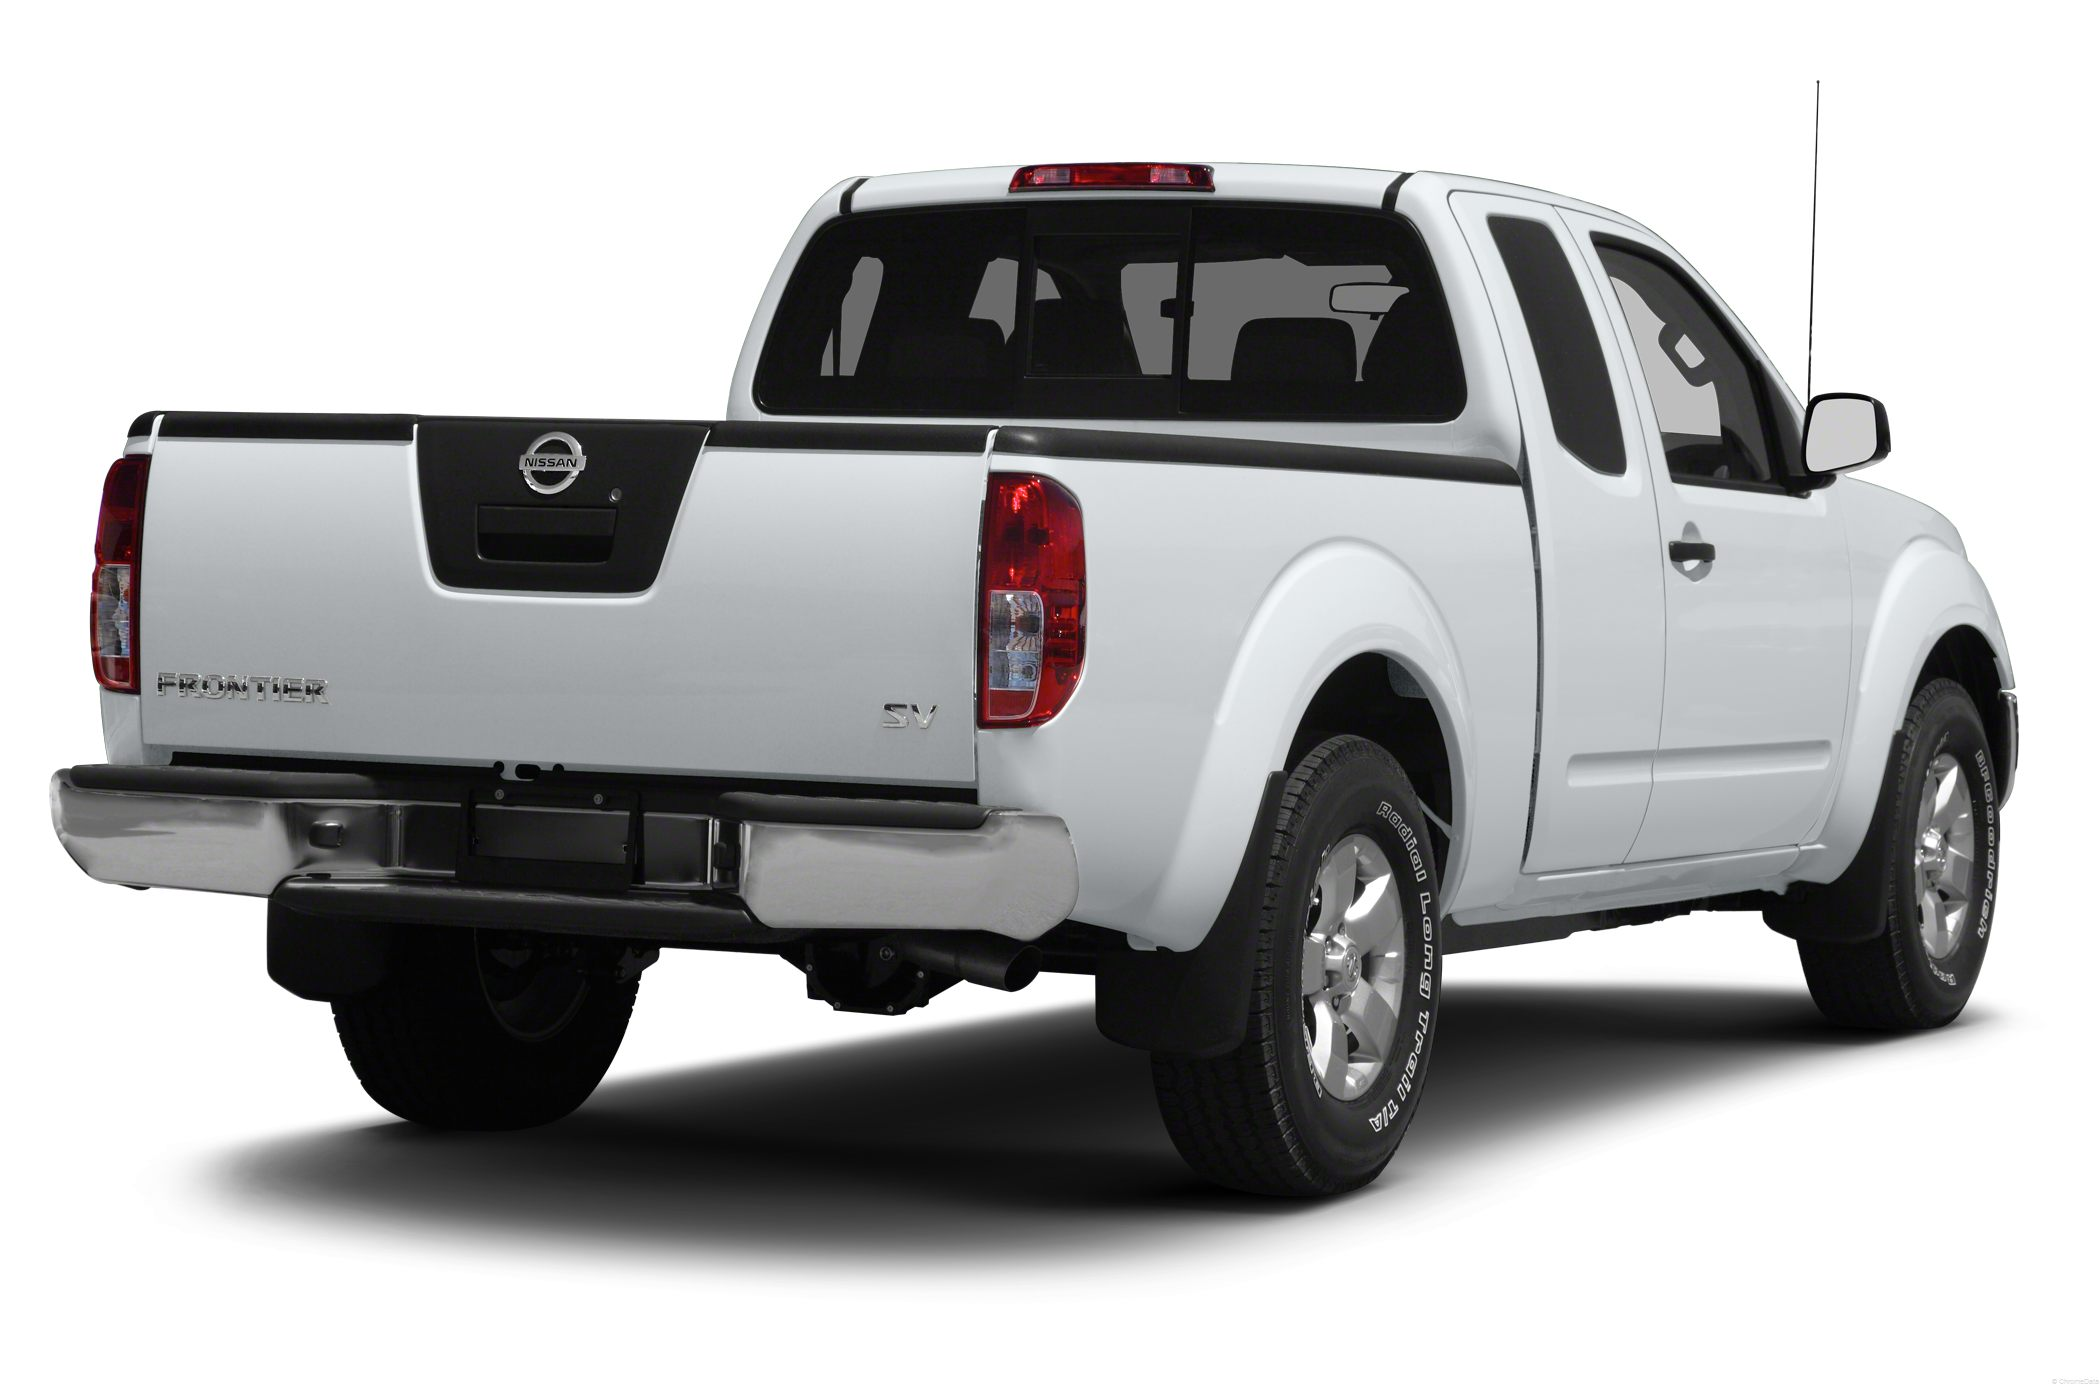 2013 Nissan Frontier Image 13